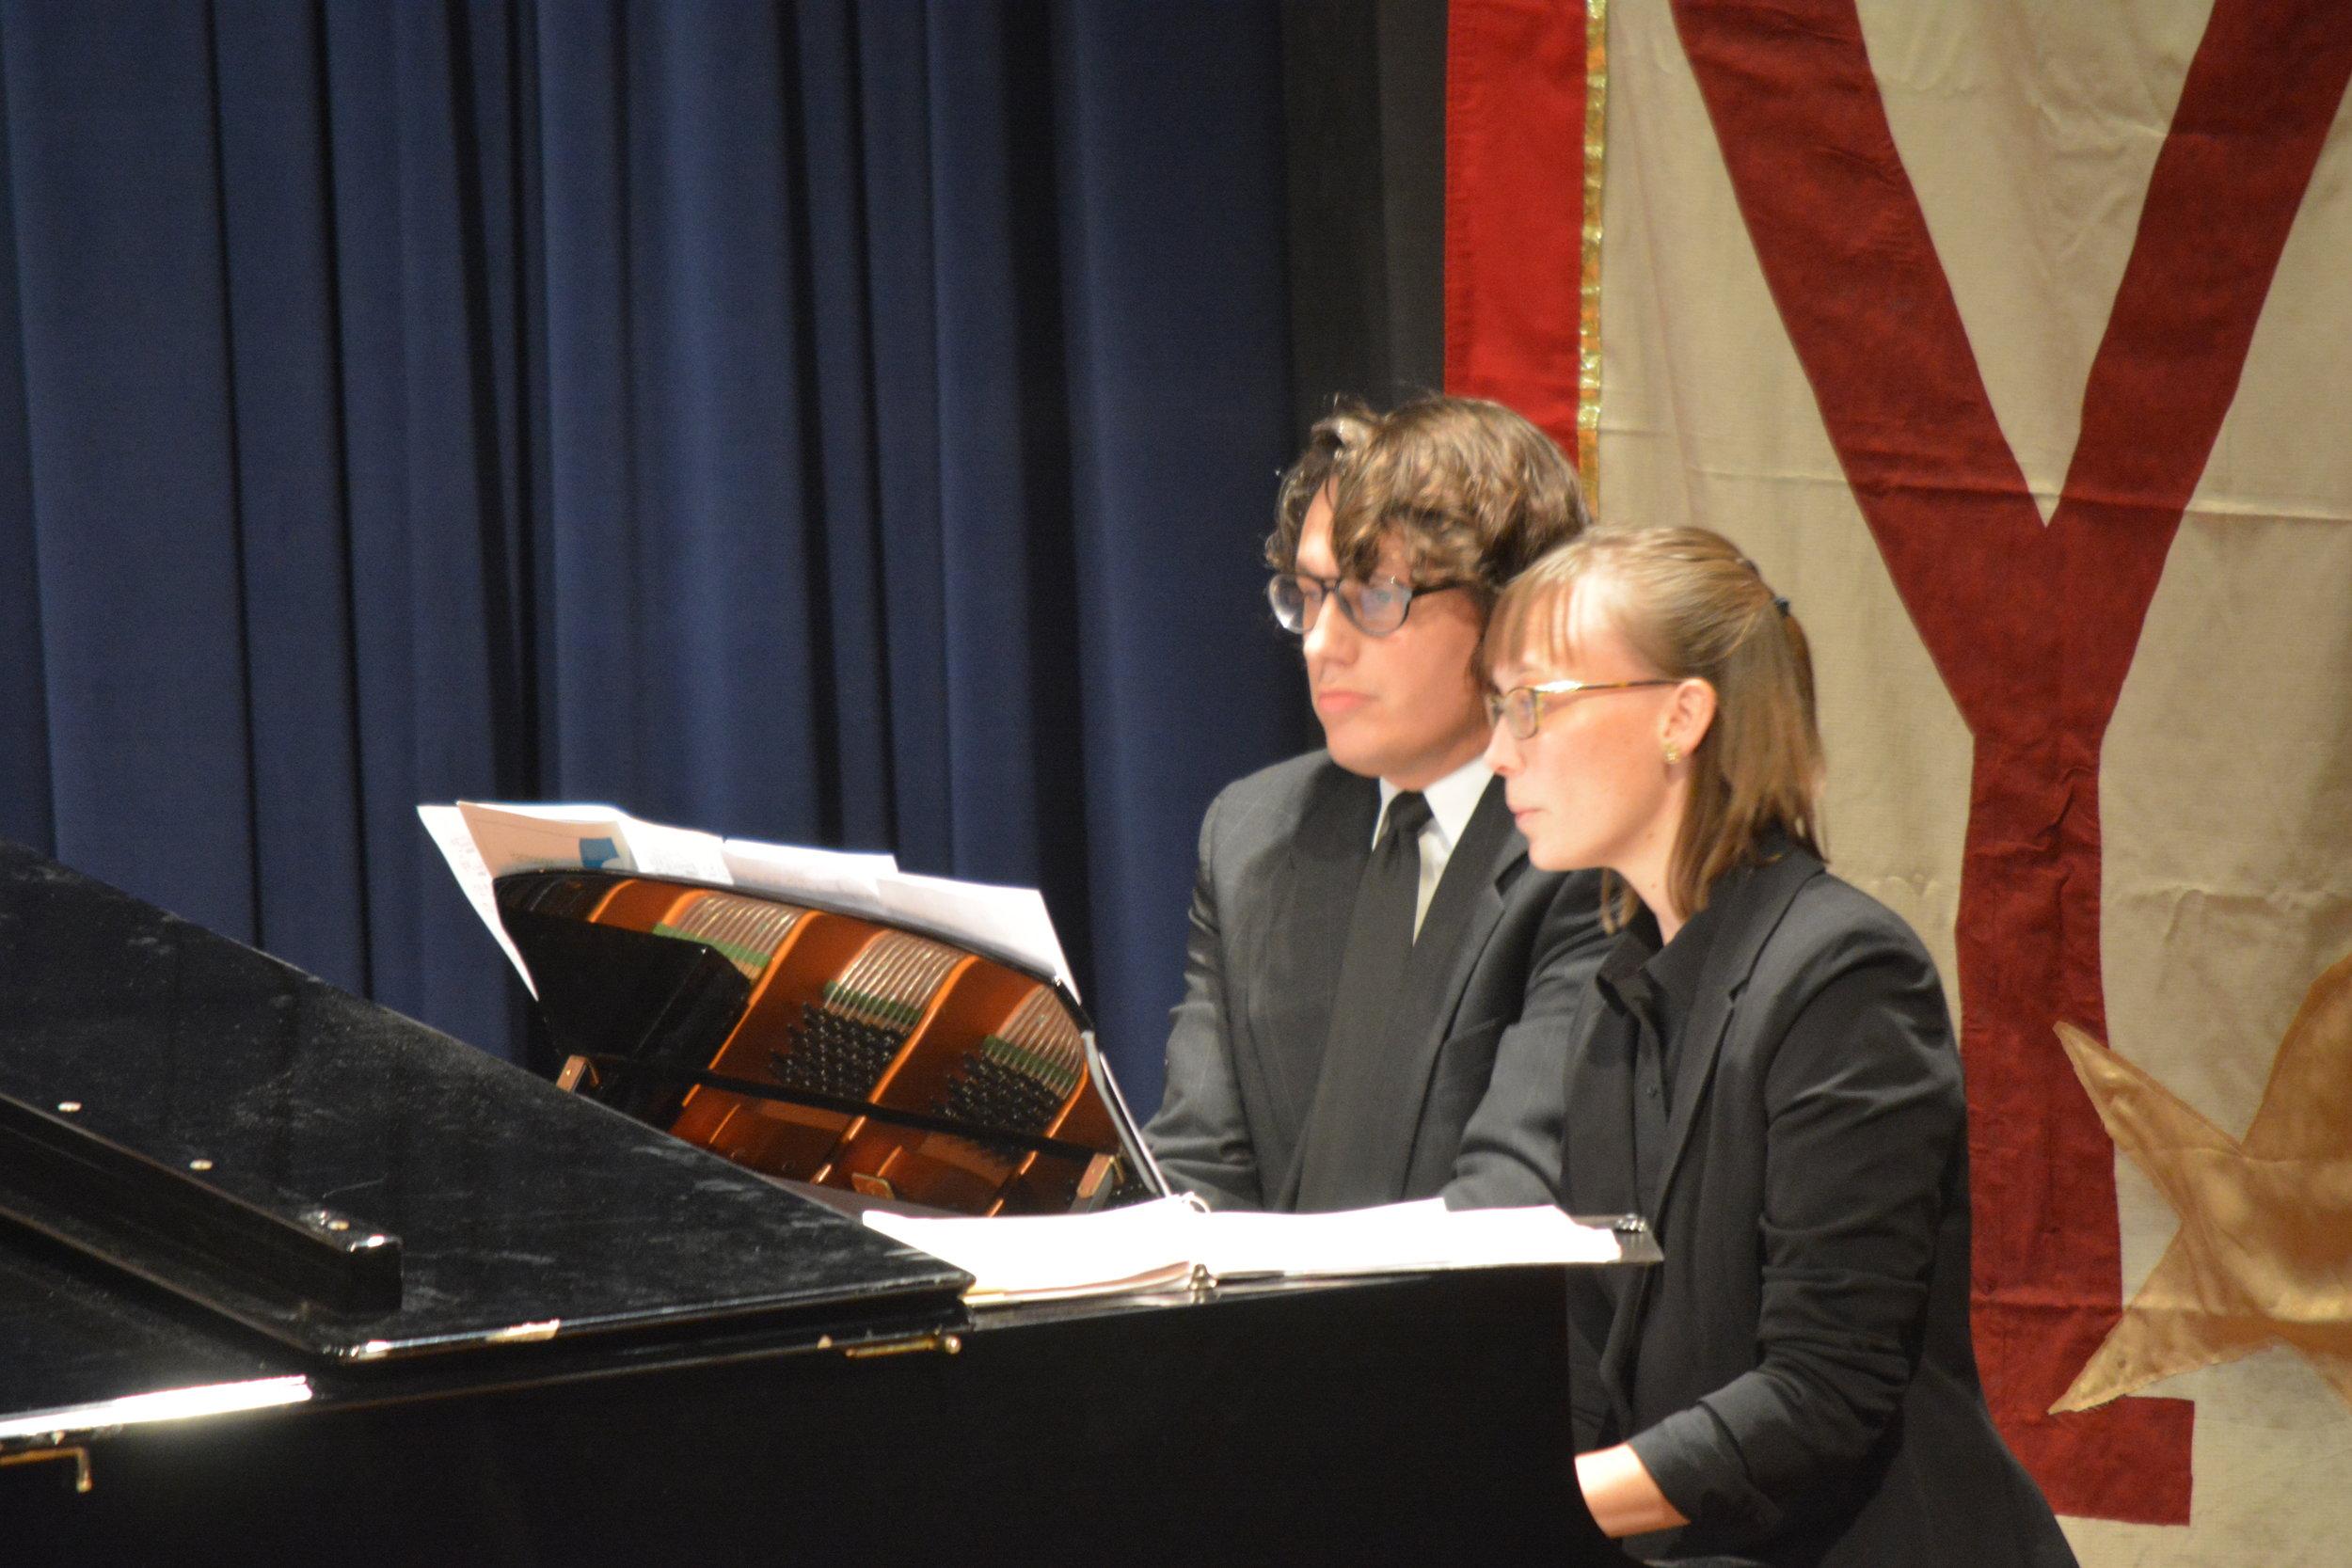 2016-12-04 Piano Duet 1.jpg